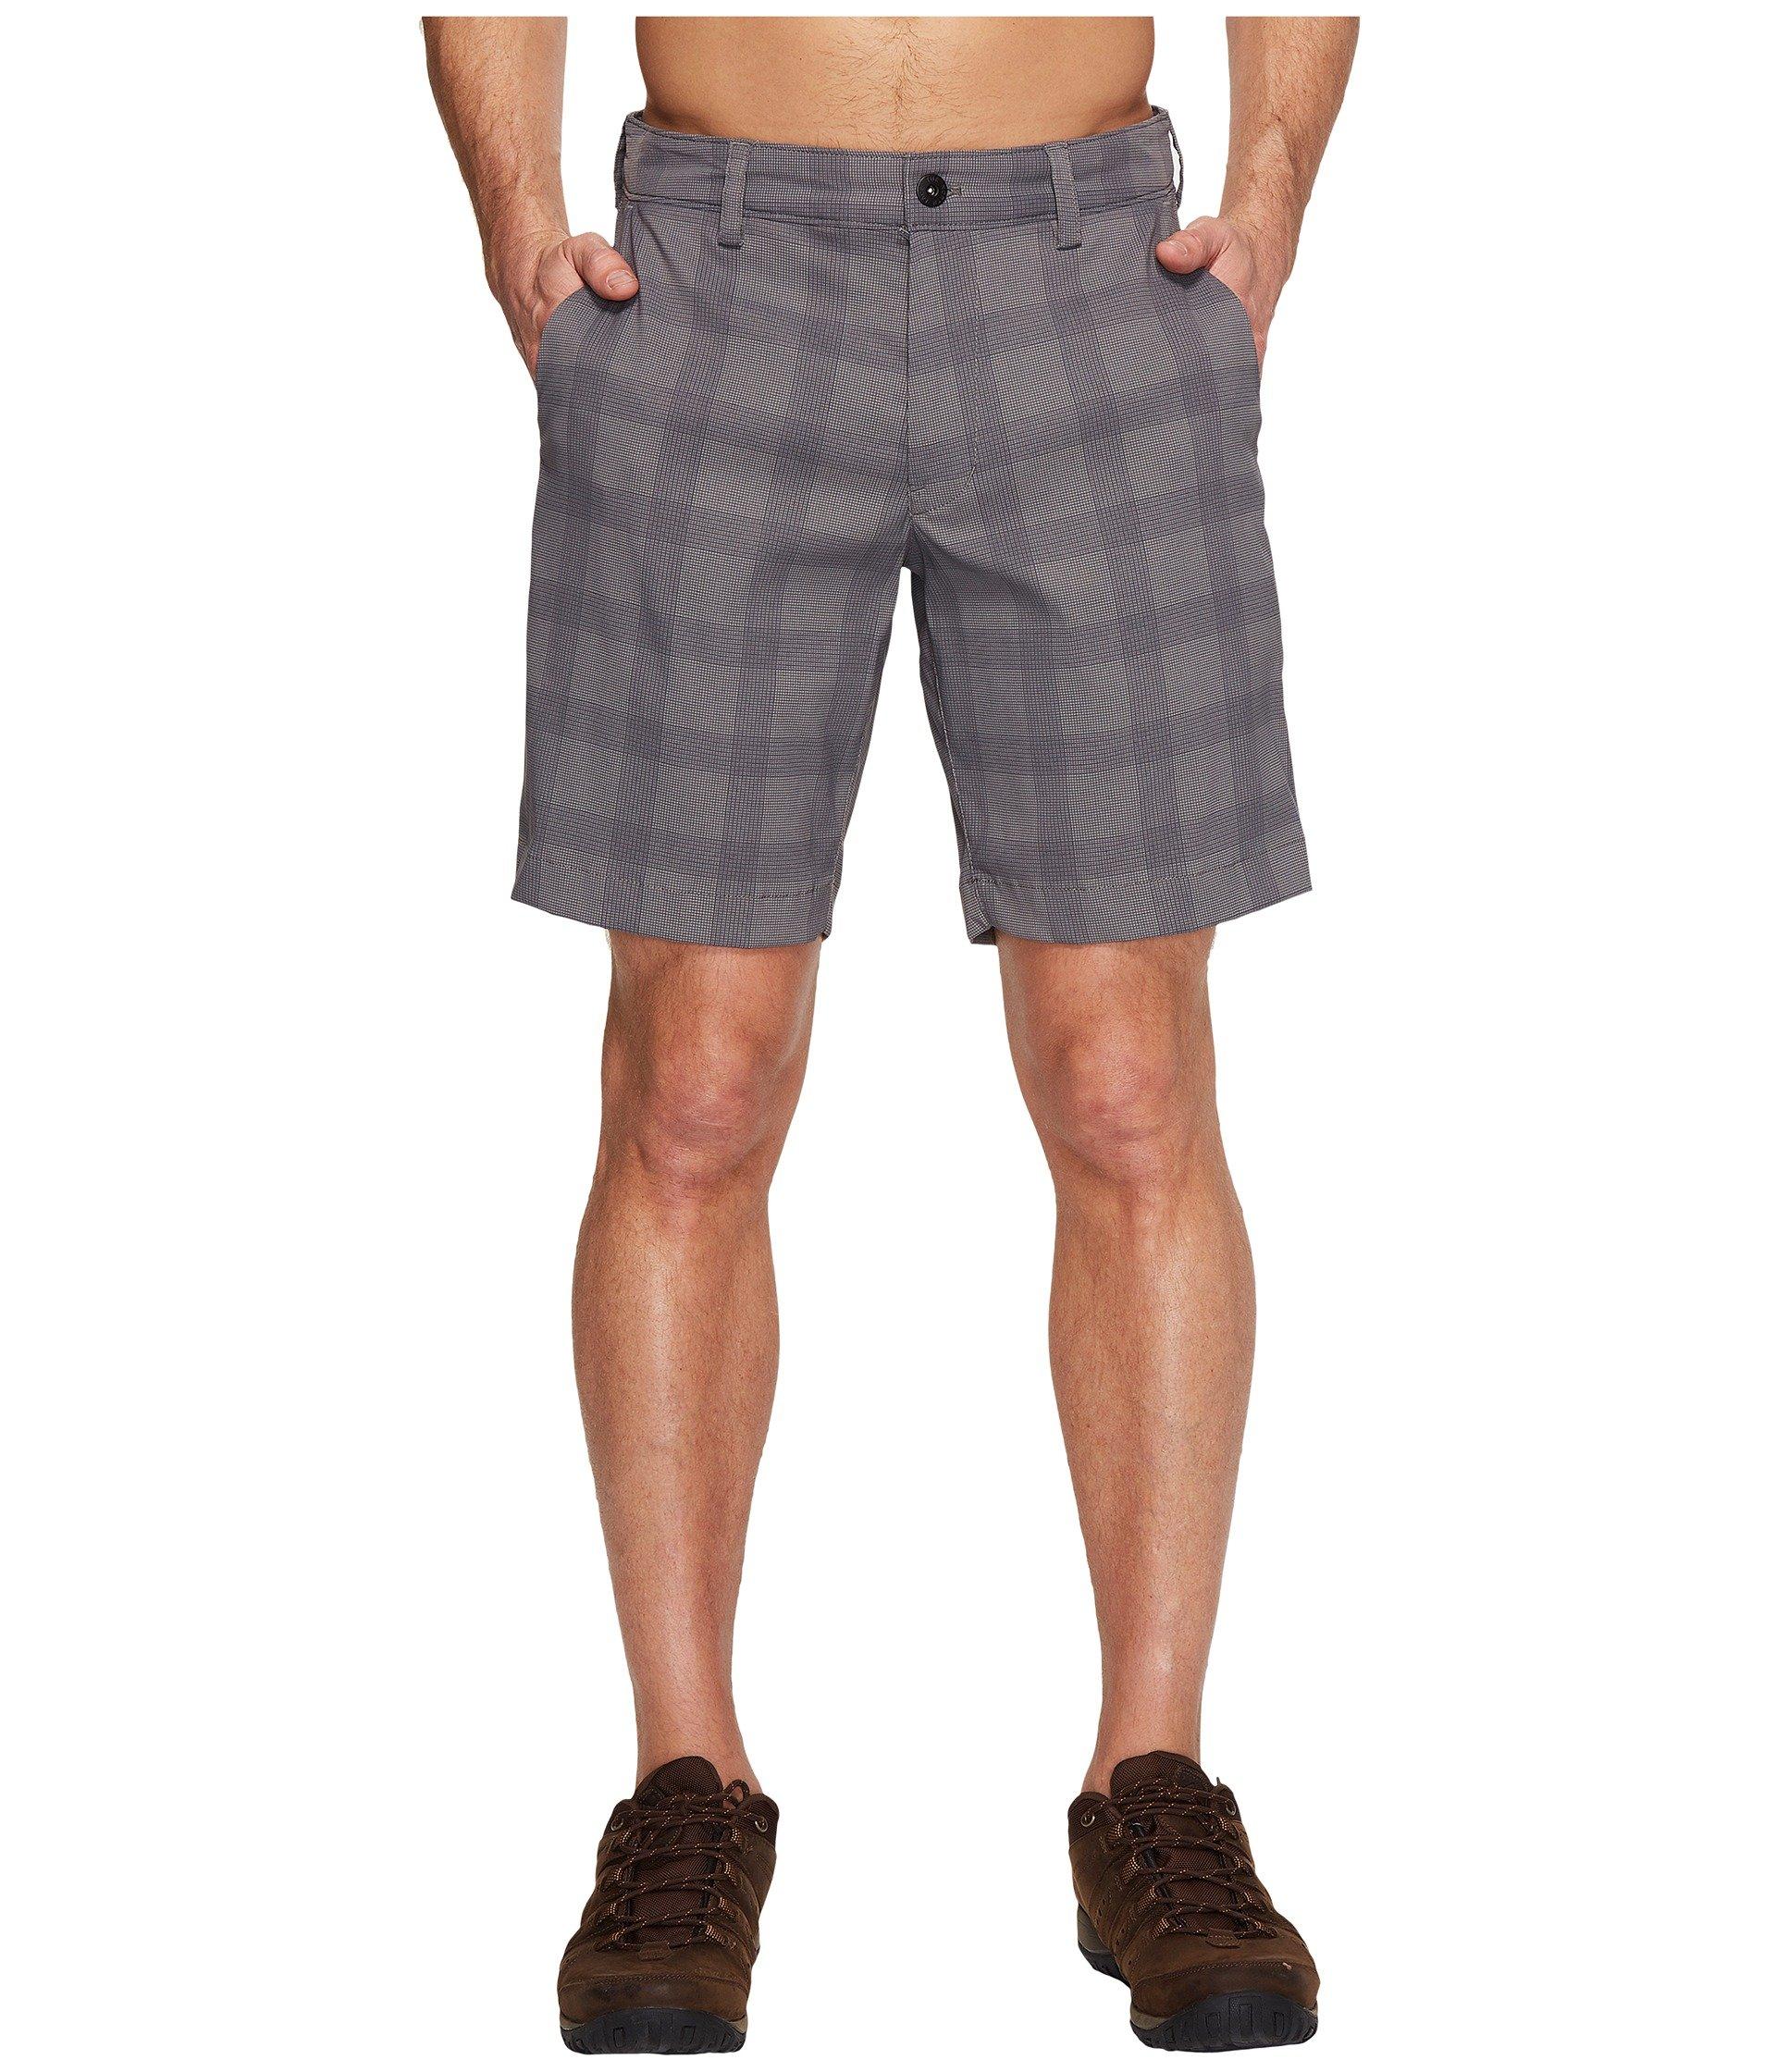 Rockaway Shorts, Zinc Grey Plaid (Prior Season)